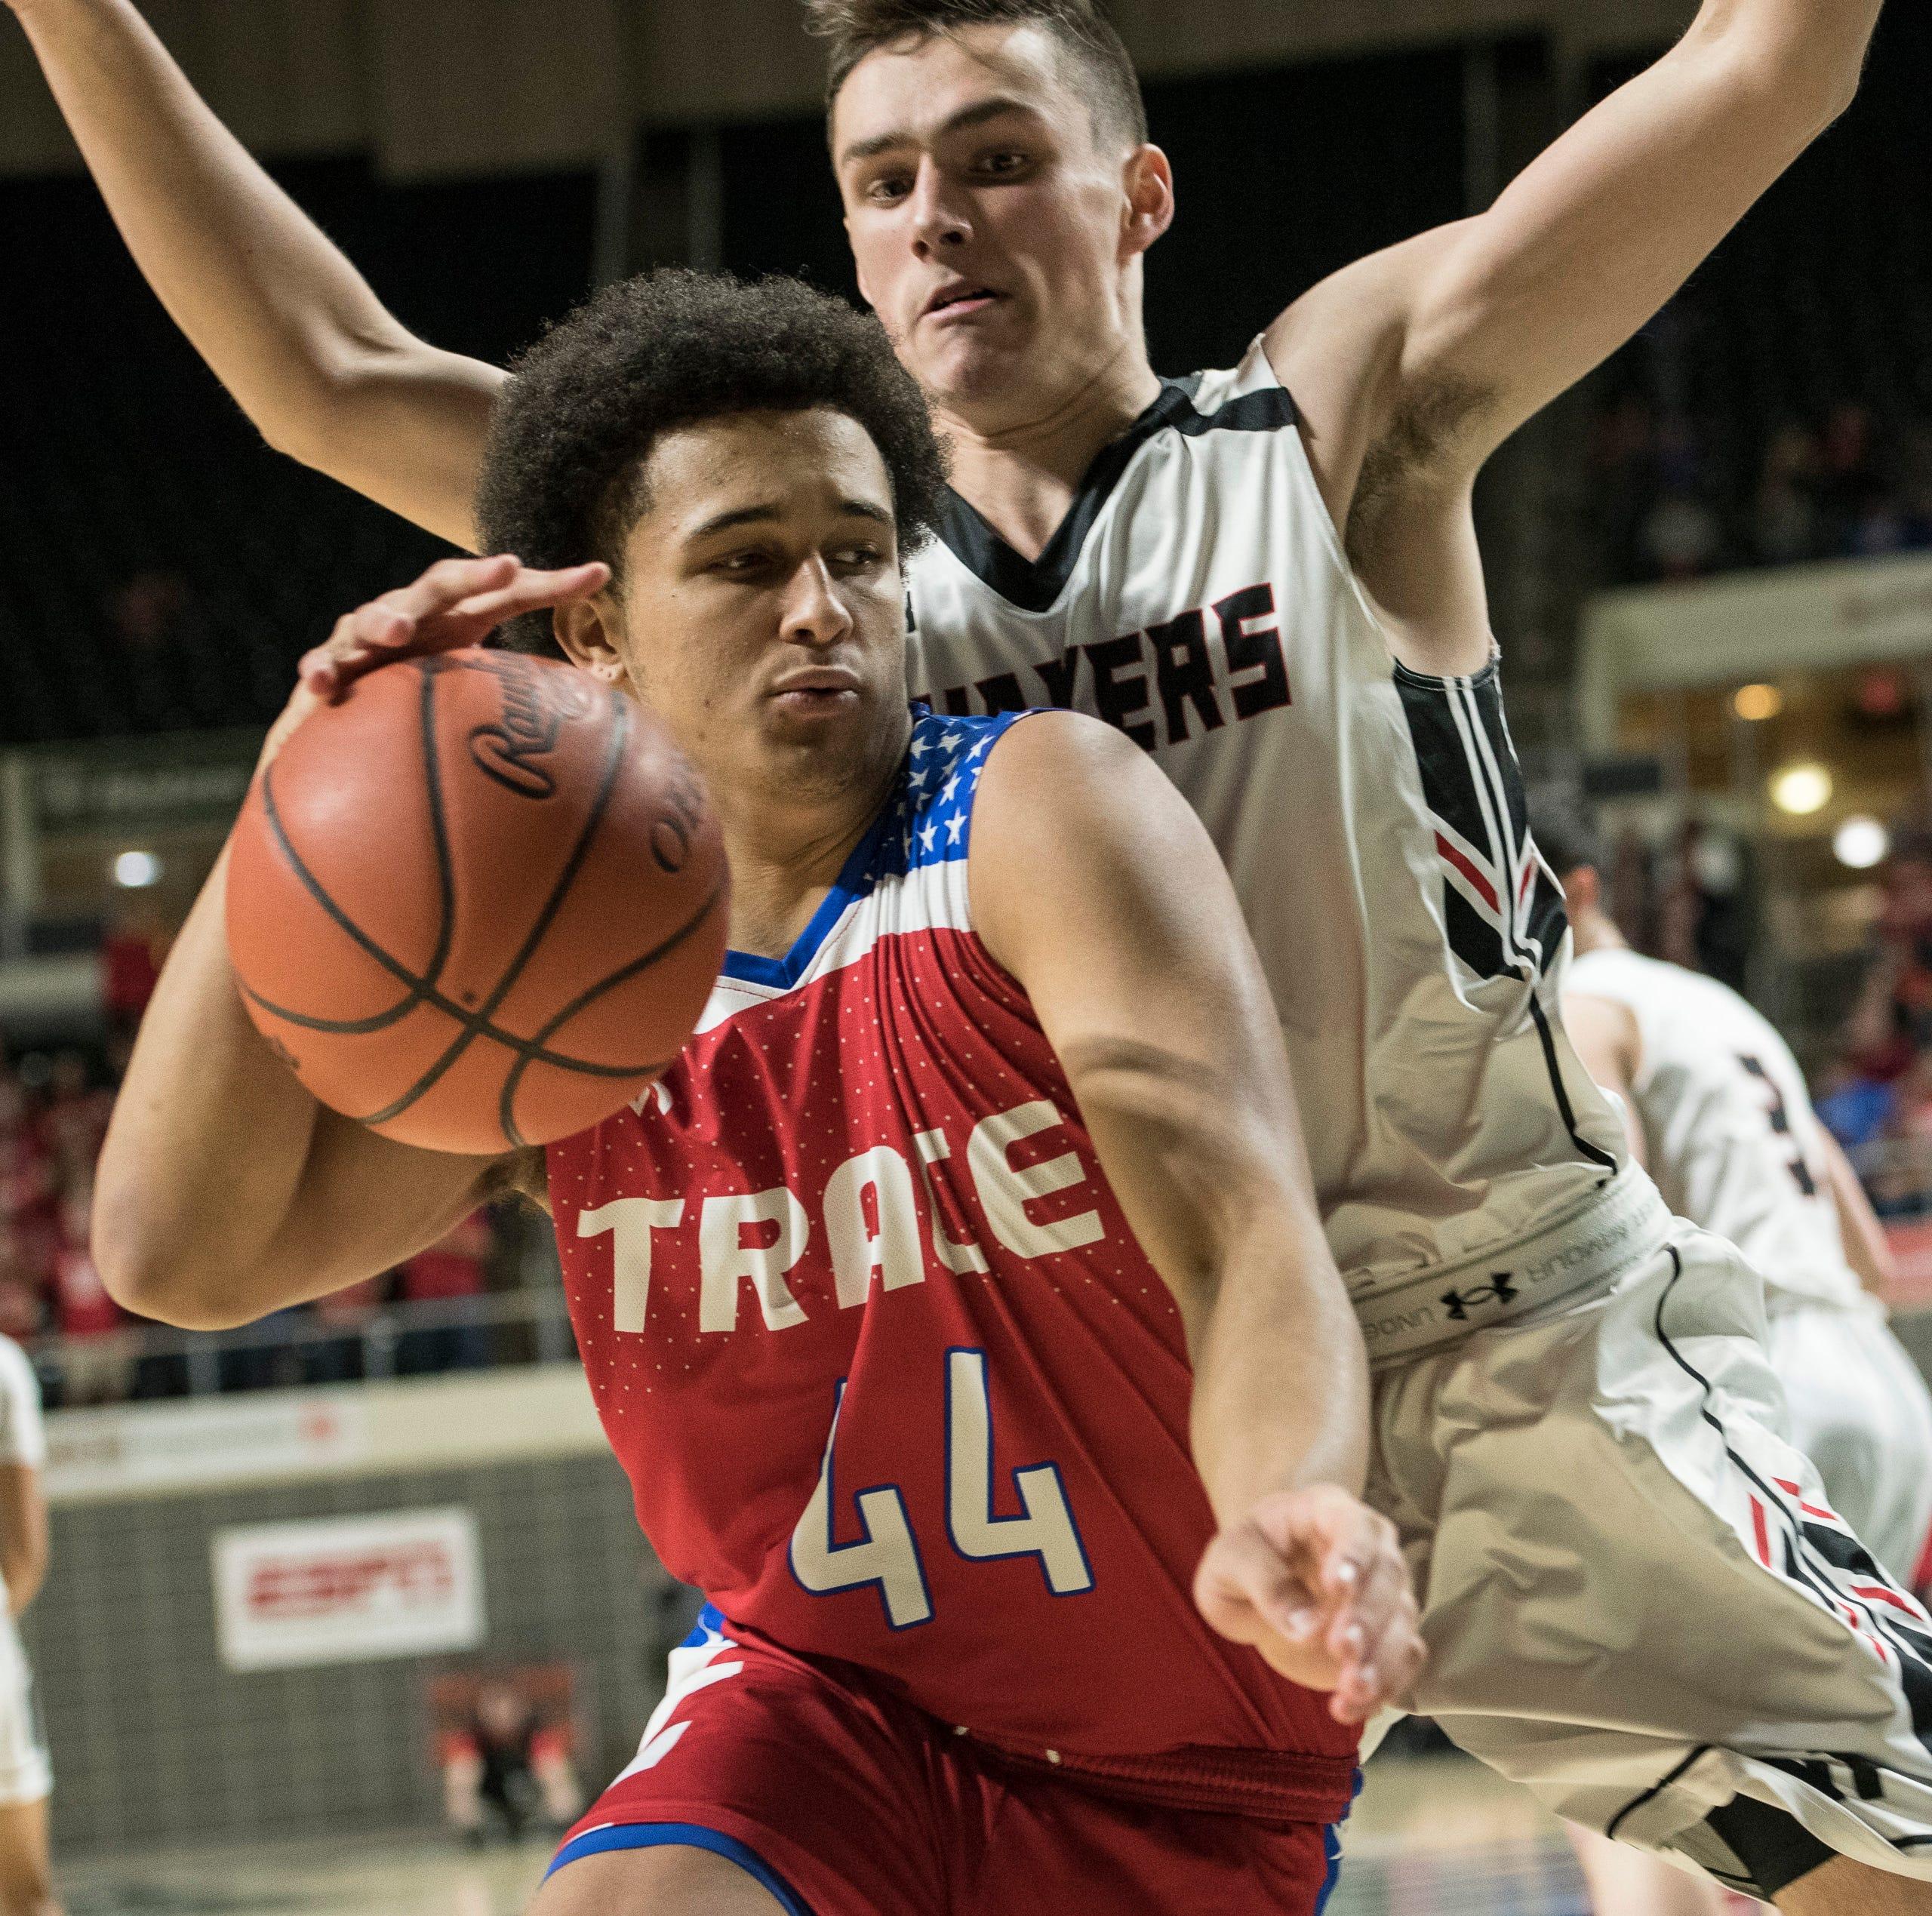 OHIO HS BOYS BASKETBALL: Zane Trace falls to New Philadelphia in regional semifinal